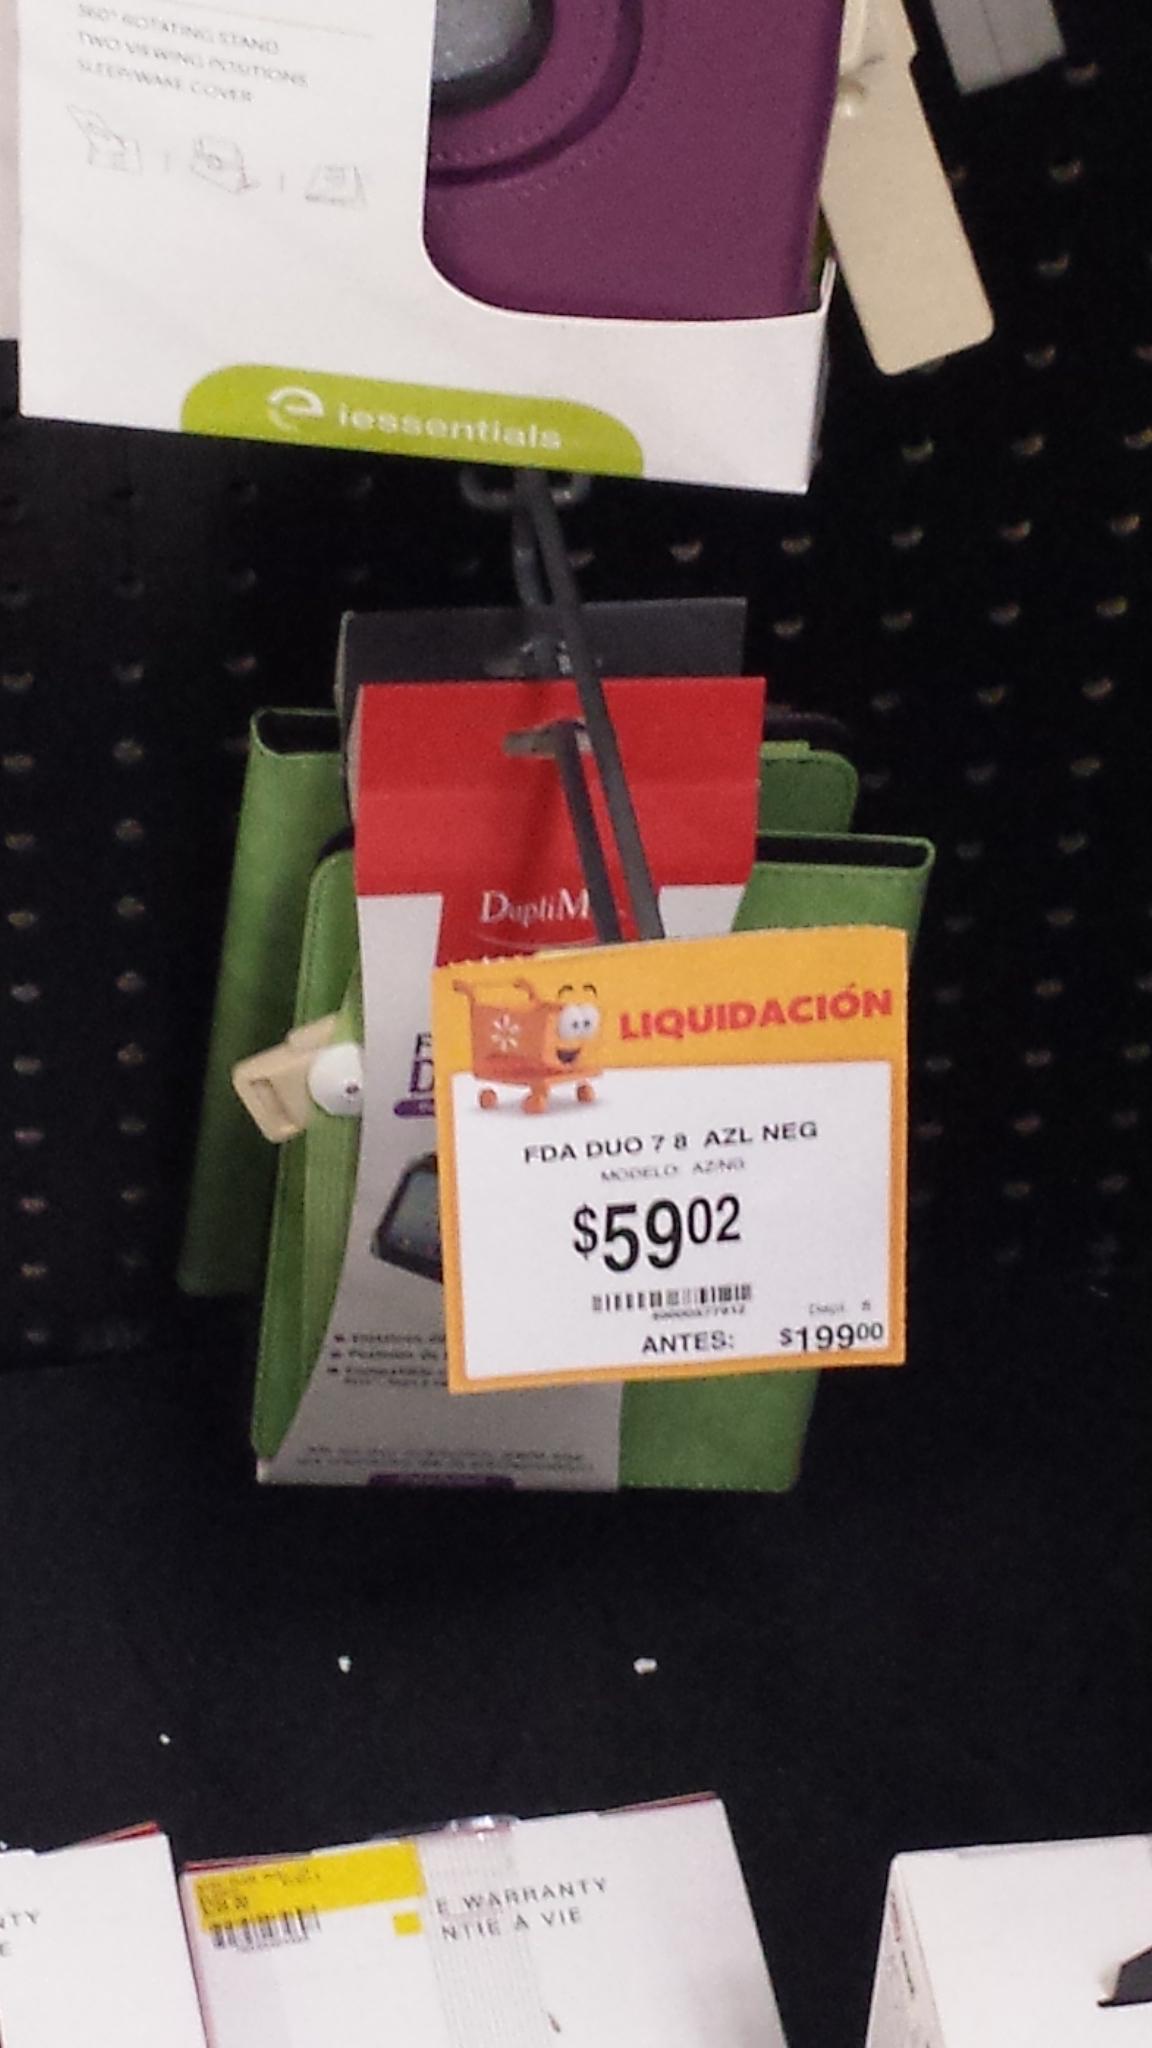 Walmart - Funda DupliMax para tablet 59.02